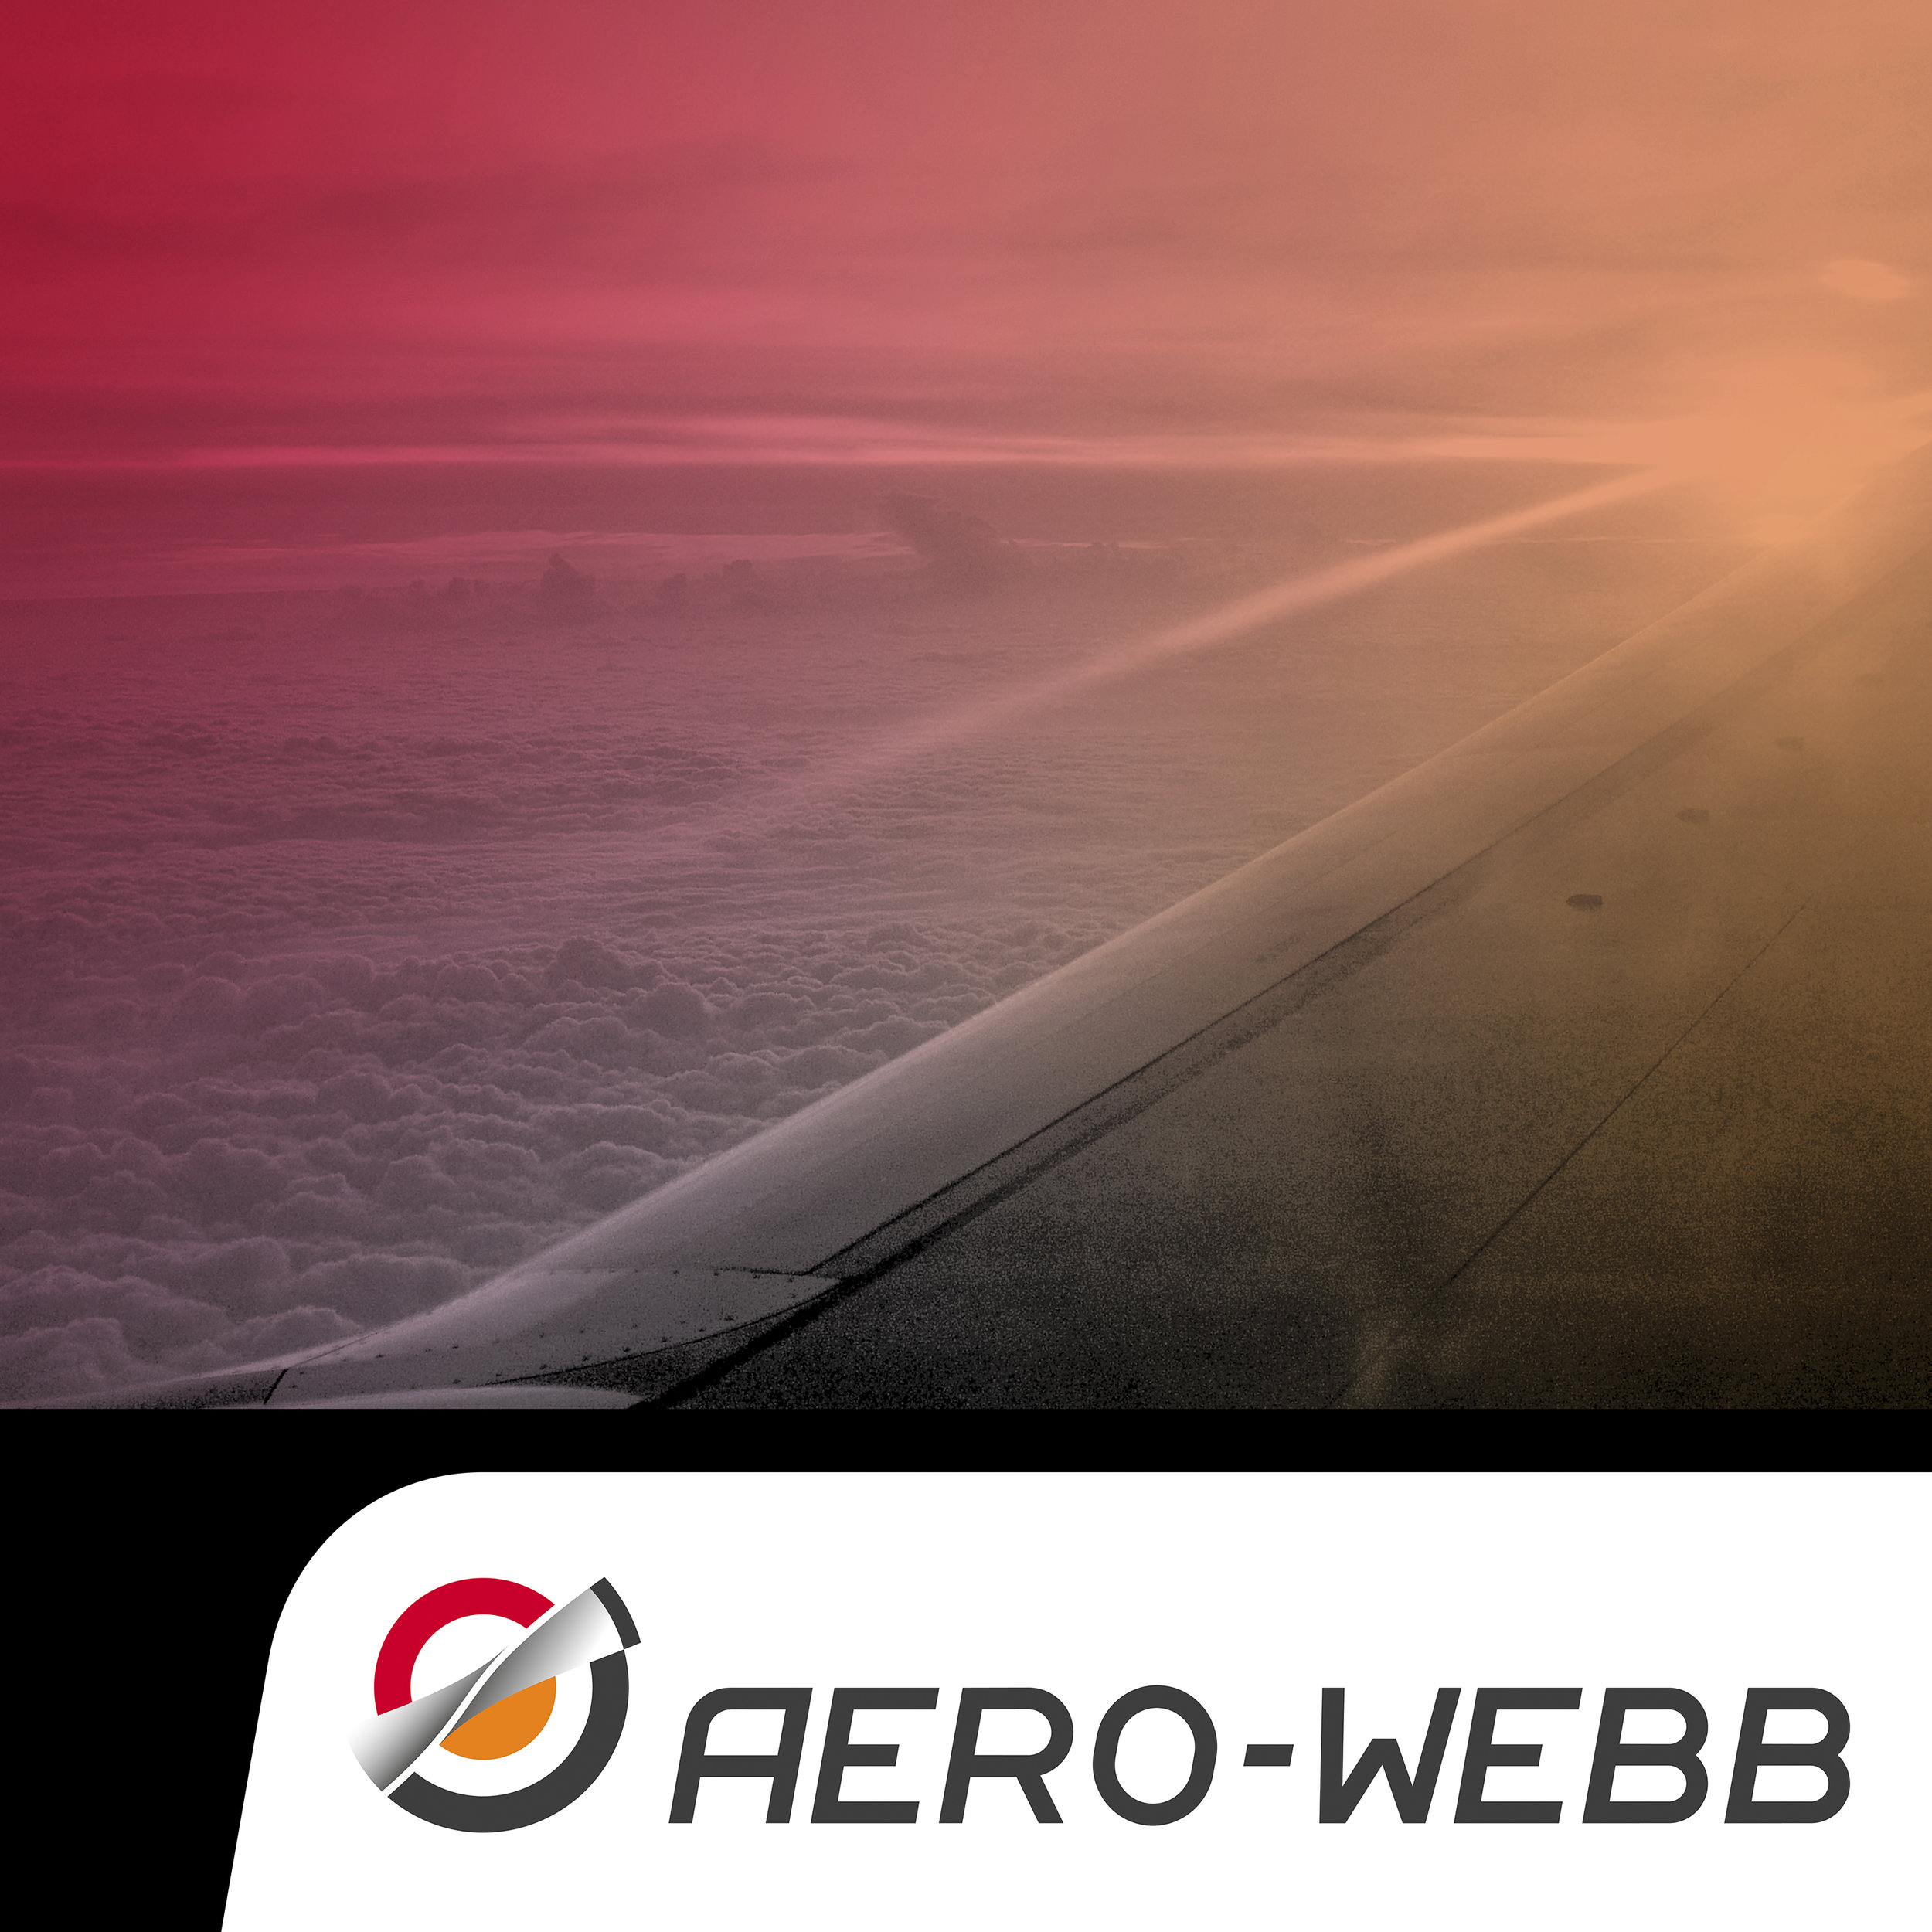 Aero-Webb